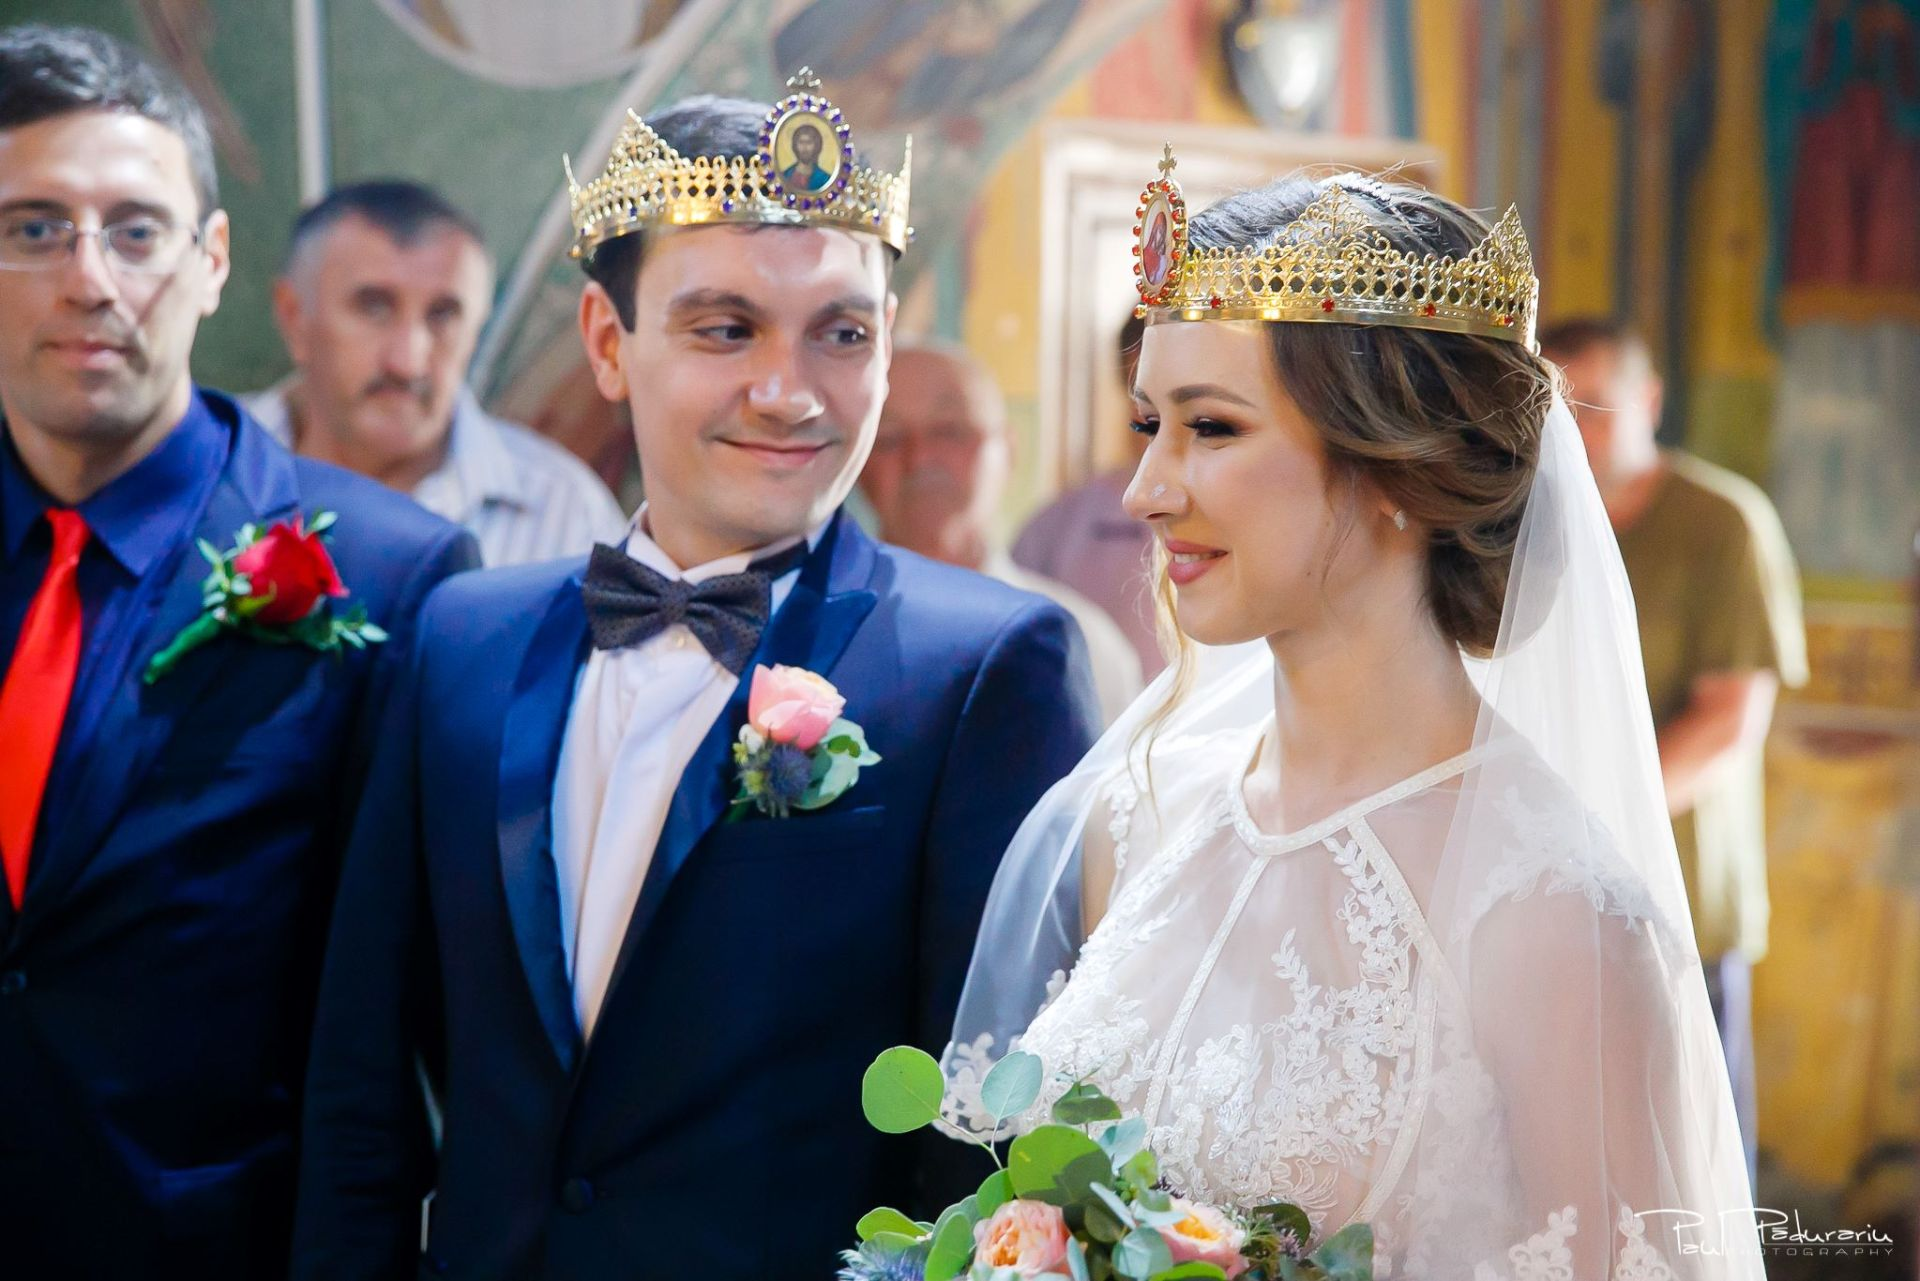 Nicoleta si Catalin fotografie nunta Iasi Biserica Rotunda Letcani fotograf nunta Iasi paul padurariu 2018 9